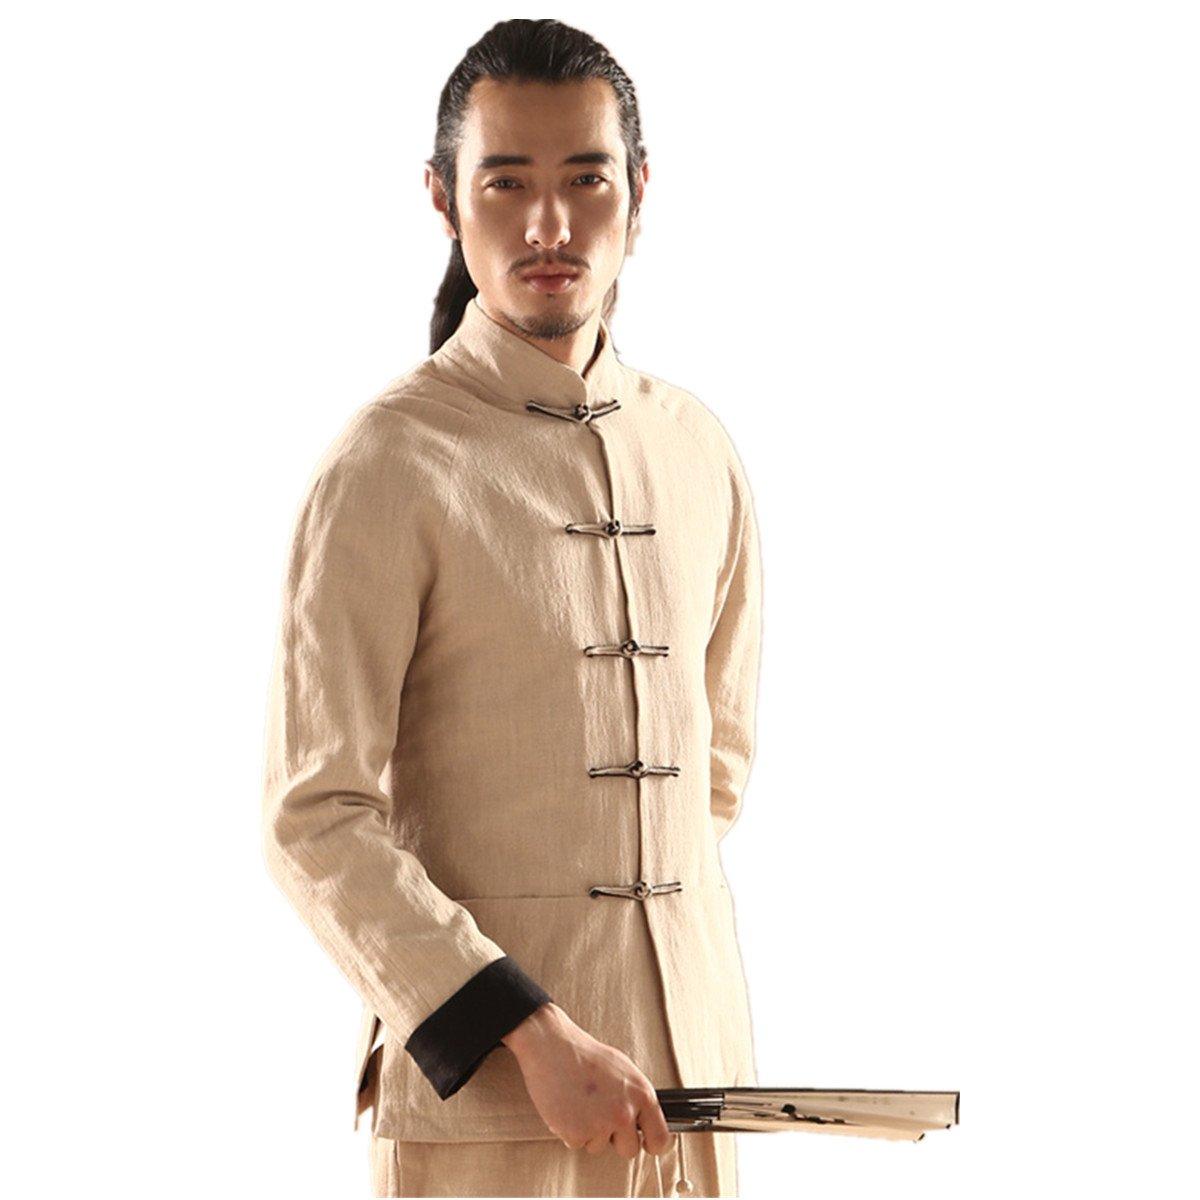 WEISAN Mens Stand Collar Japan Tang Suit Cotton Linen Kung Fu Meditation Costume